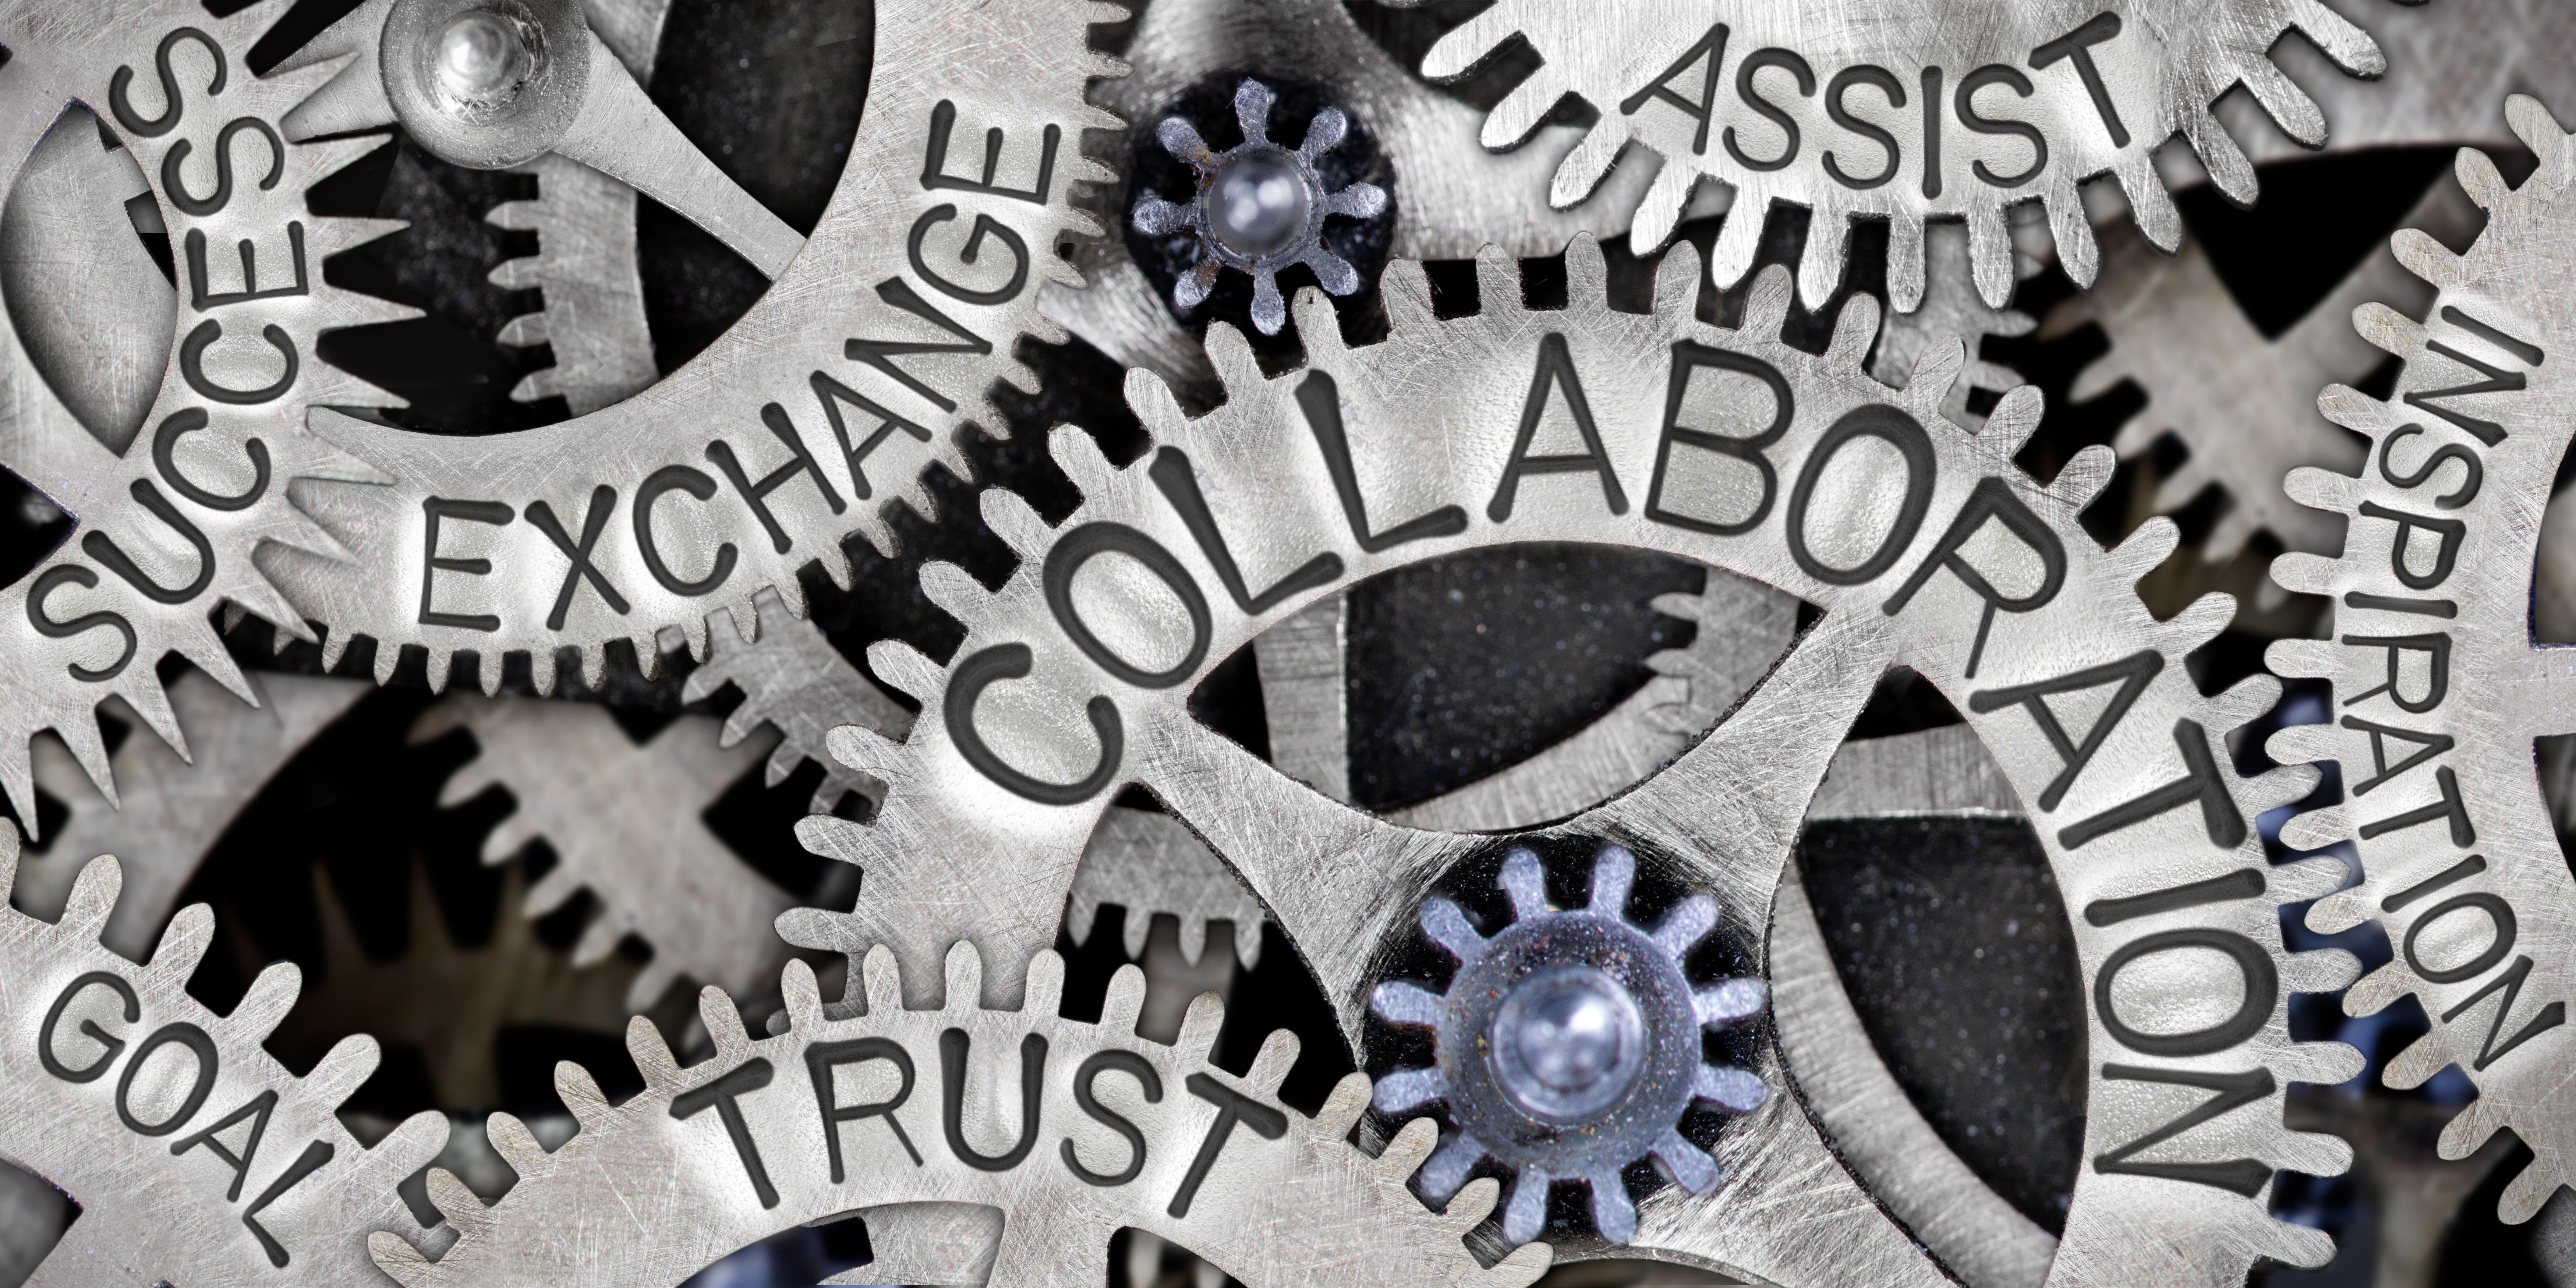 Collaboration, trust, exchange, success